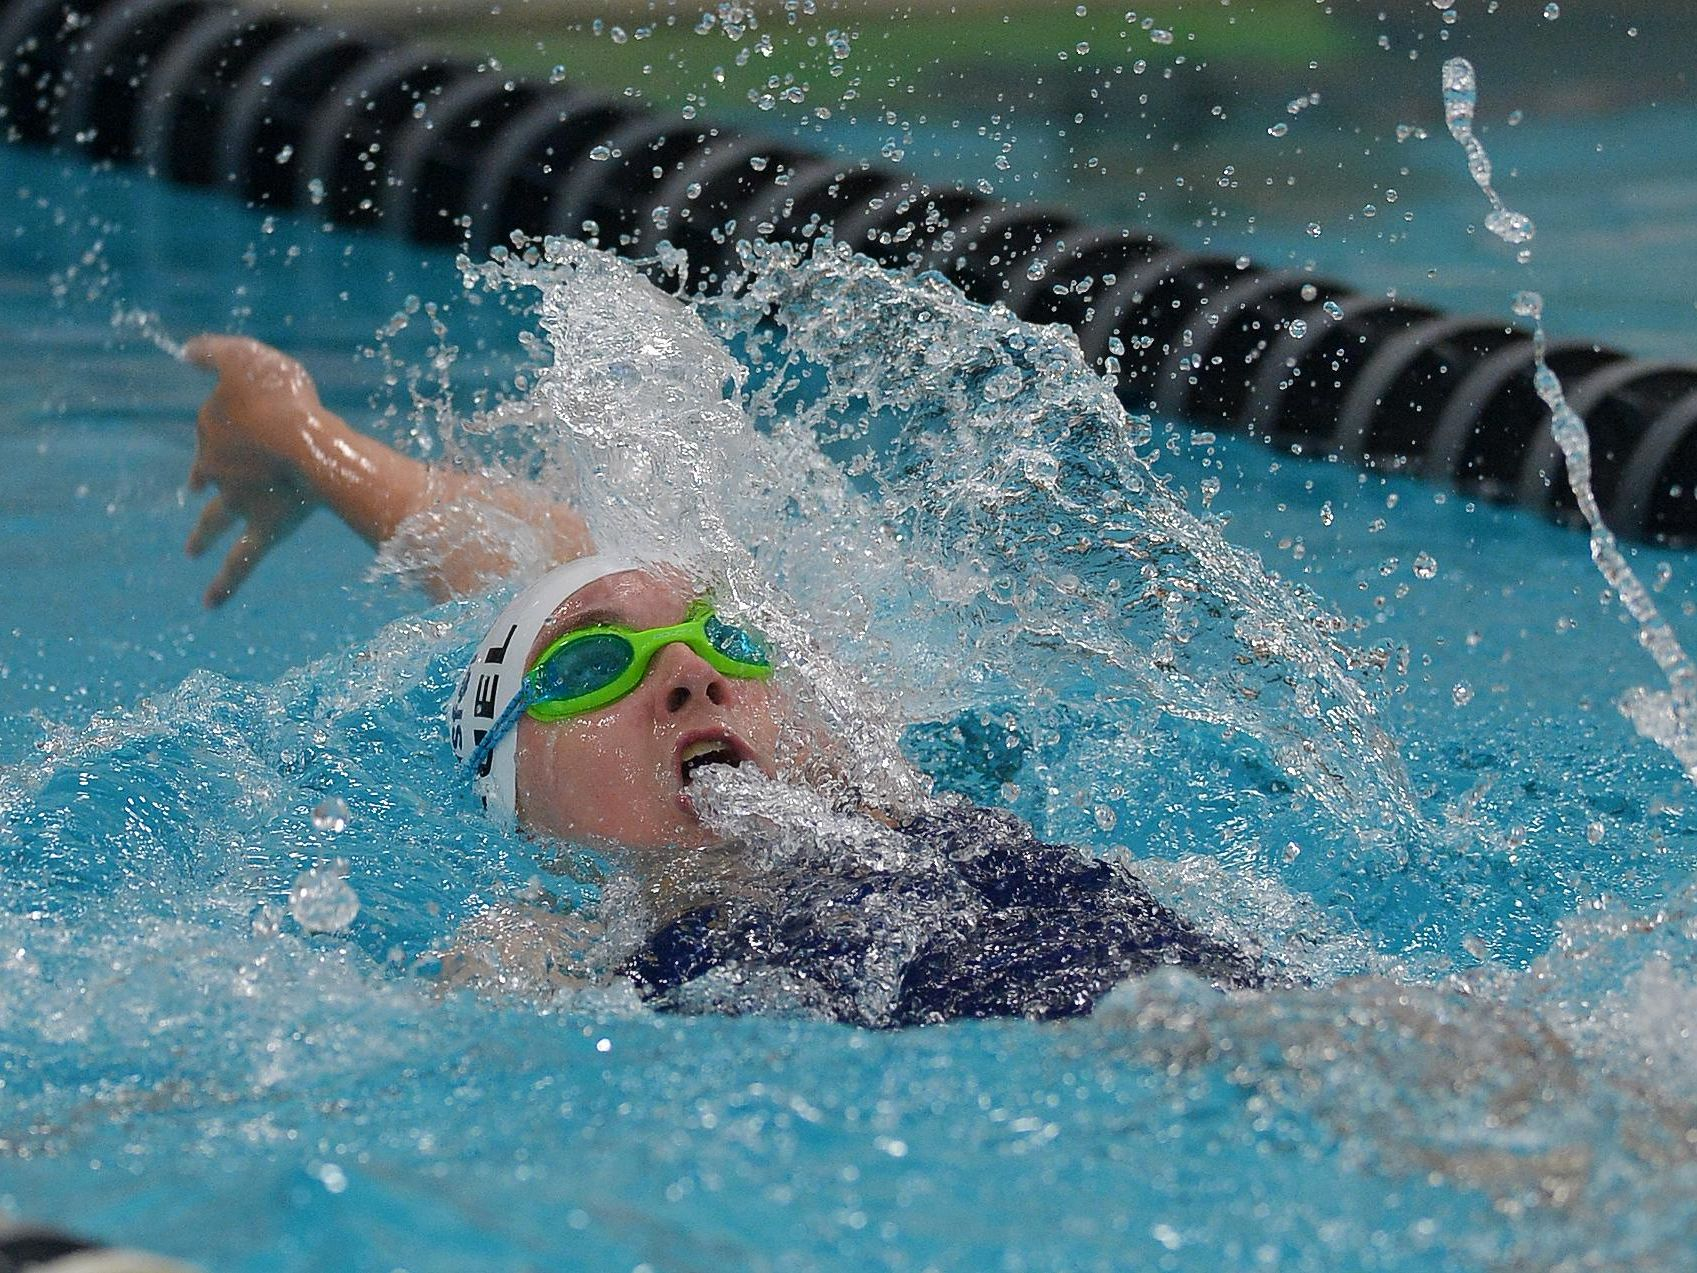 Pittsford's Megan Deuel swims the 100 yard backstroke.